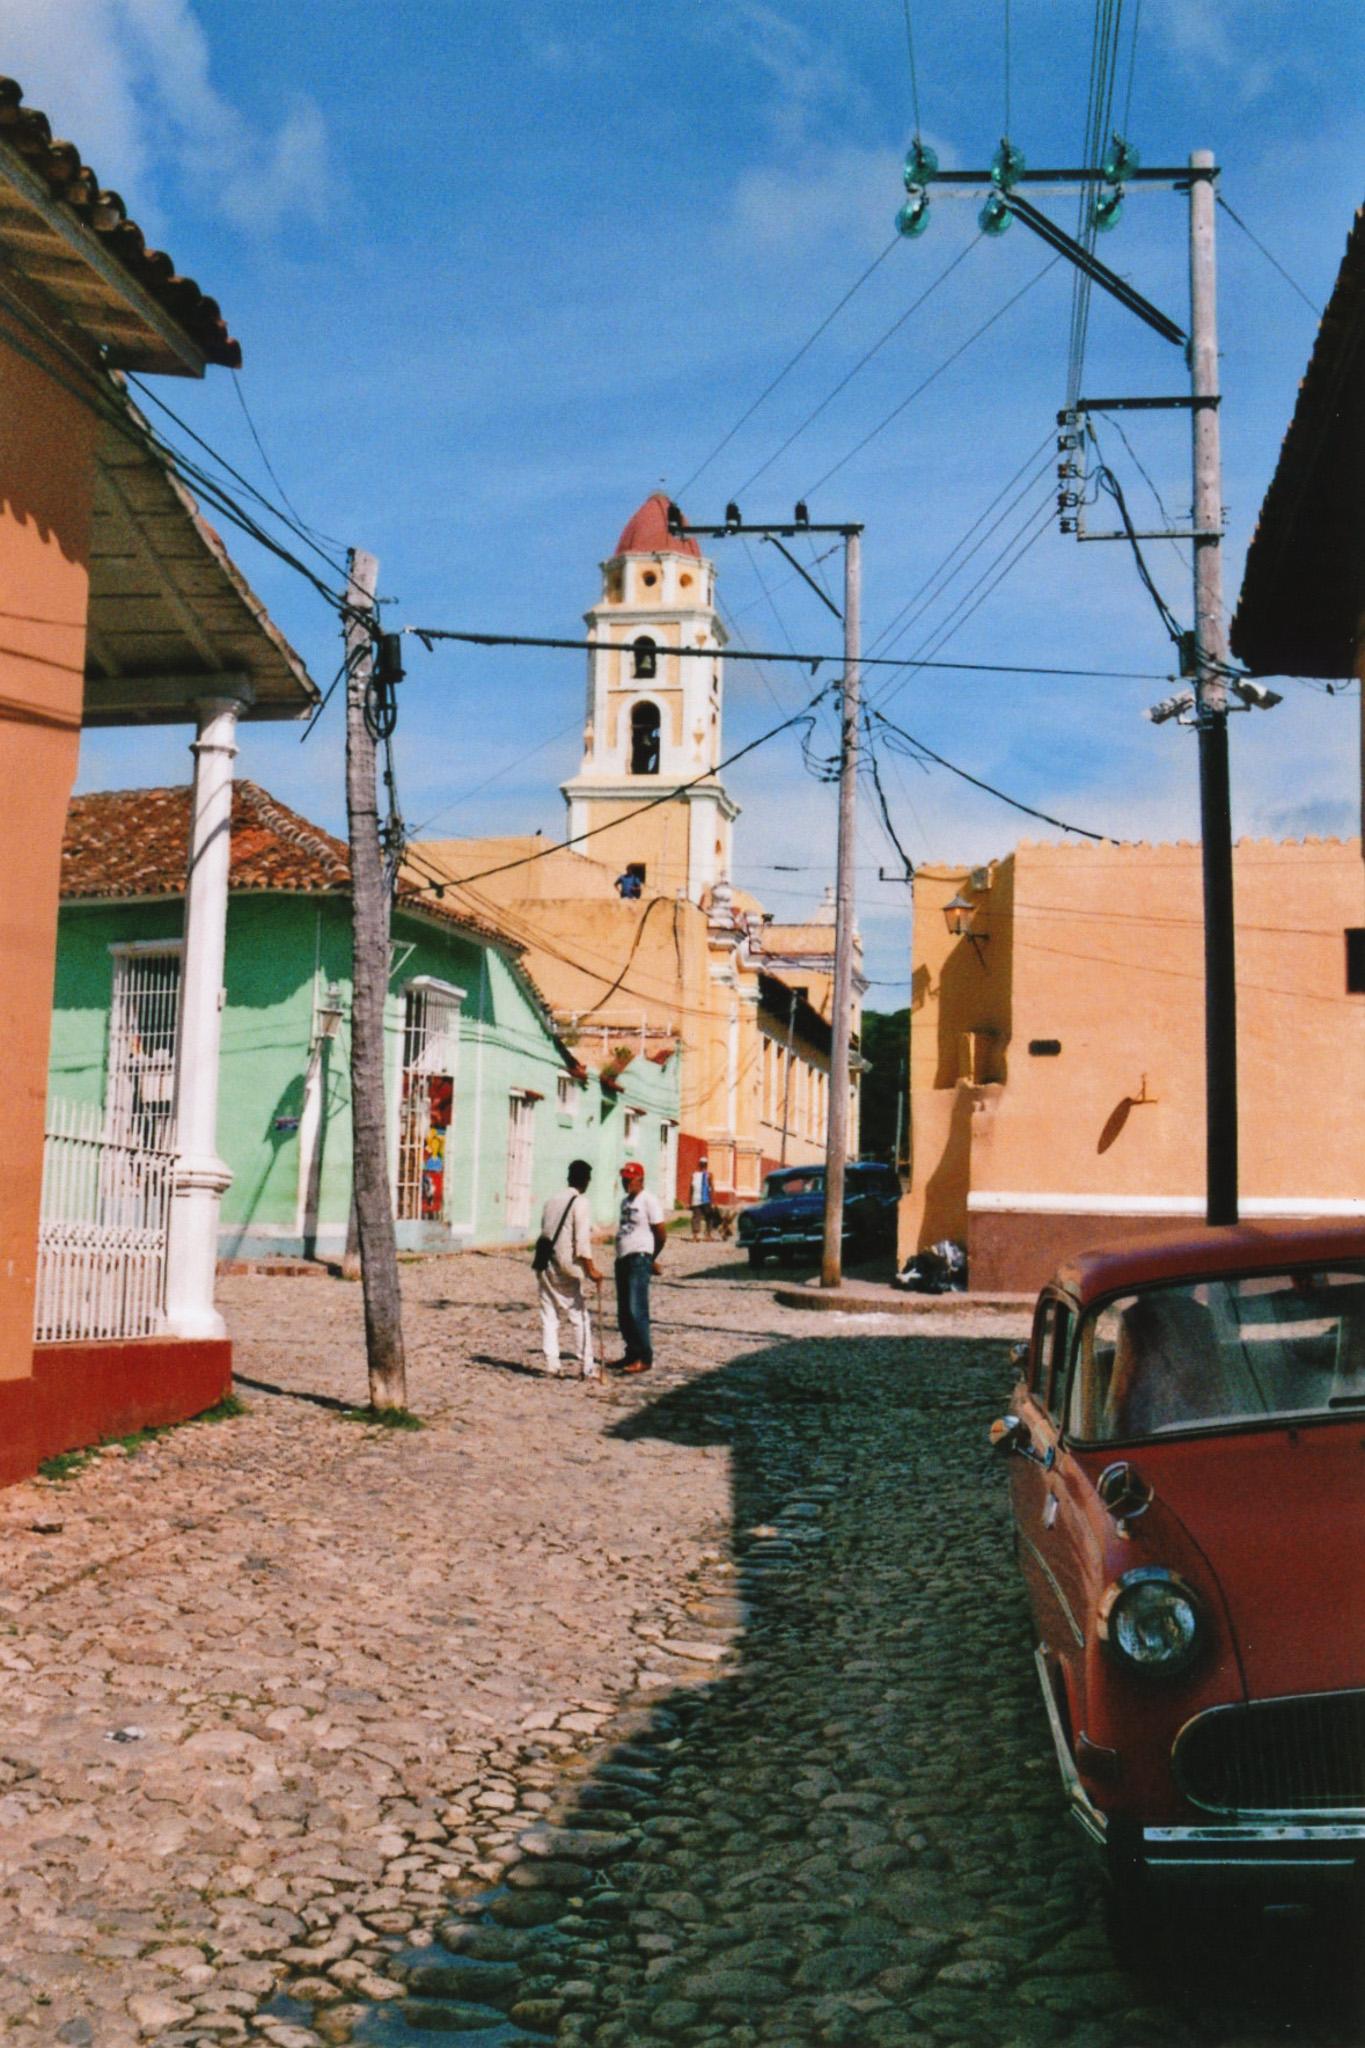 Kuba-2017-12-Analog-009.jpg